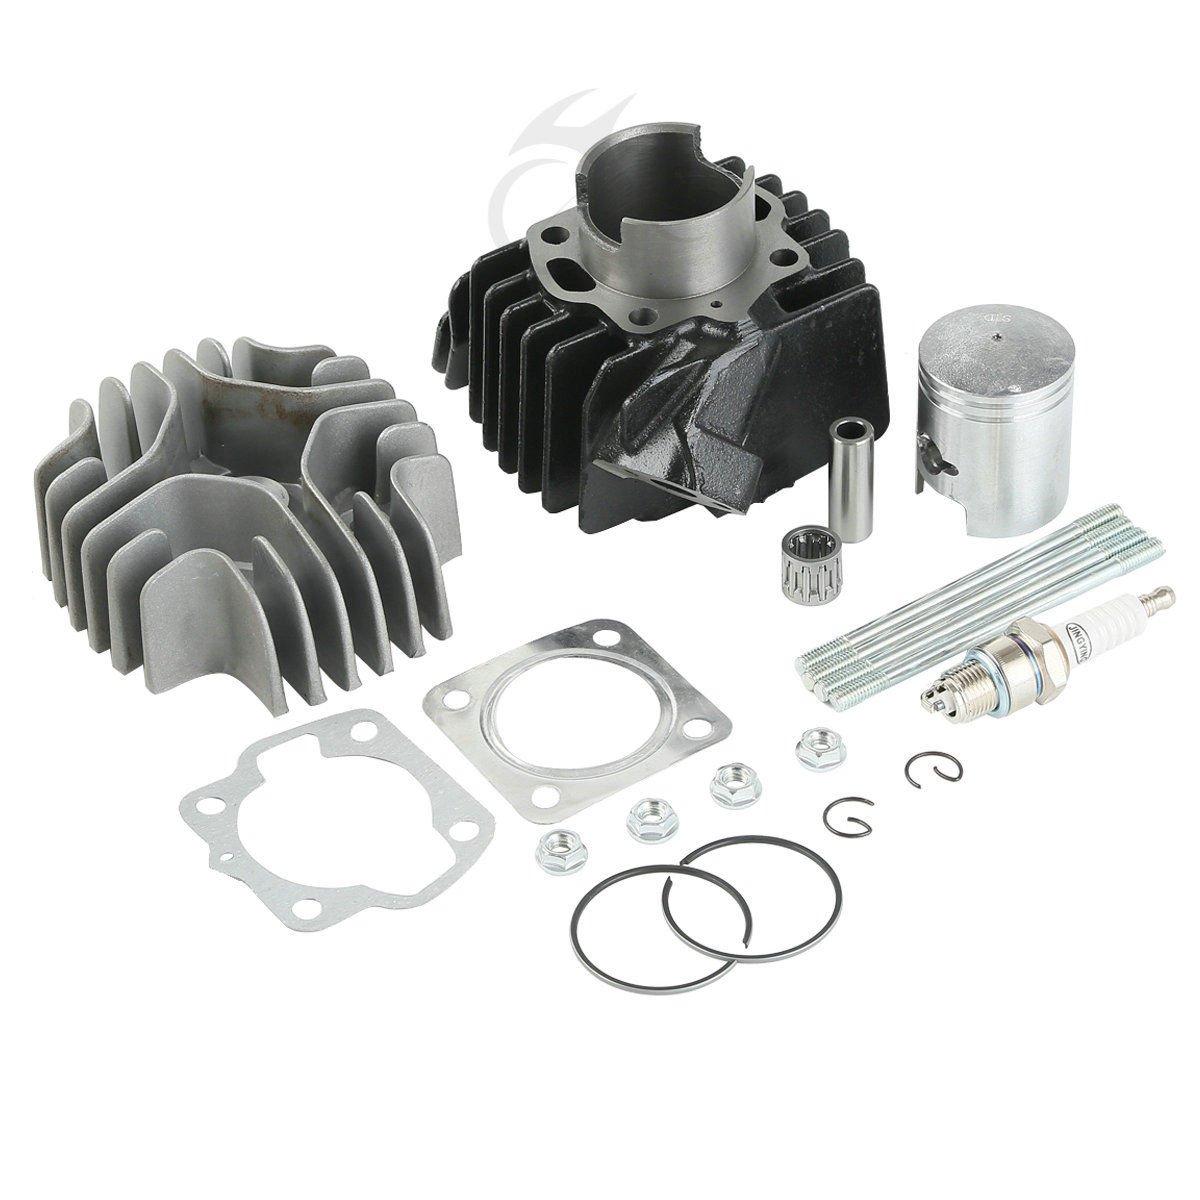 XFMT Big Bore 50cc Cylinder Piston Gasket Head Top End Kit for Suzuki JR50 1978-2006